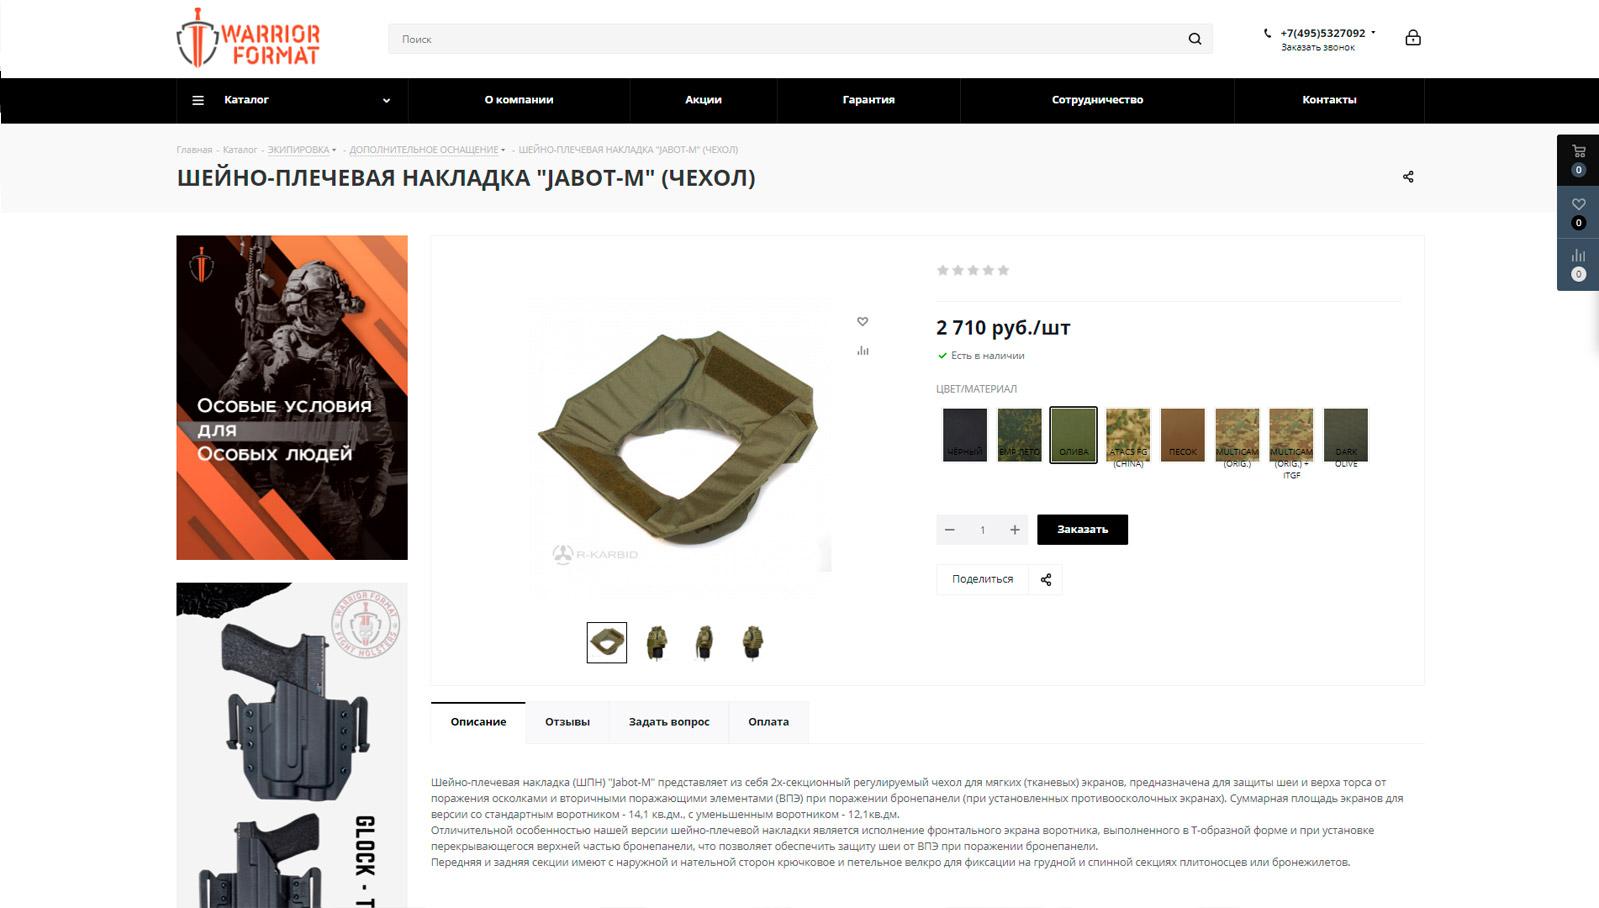 SPS_sajt_warrior-format.ru6